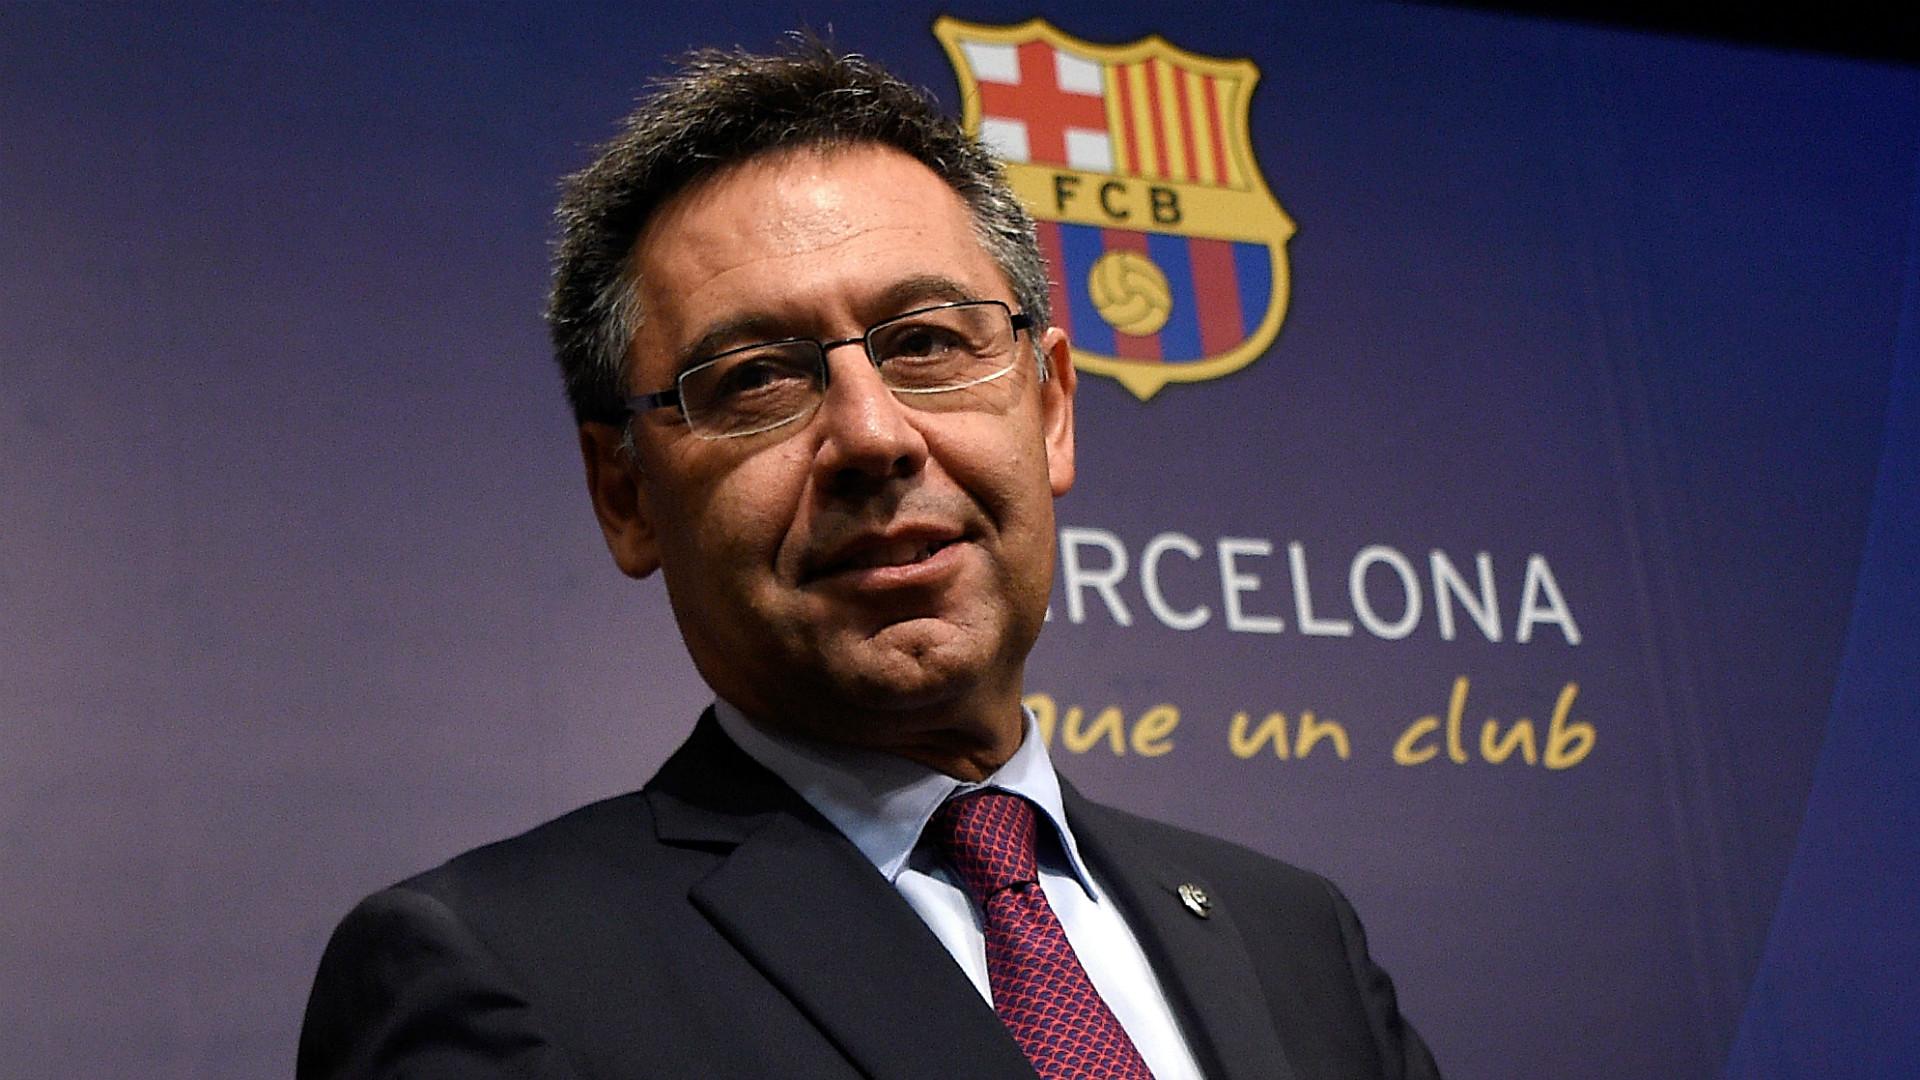 Bartomeu resigns as Barcelona president as entire board steps down |  Goal.com